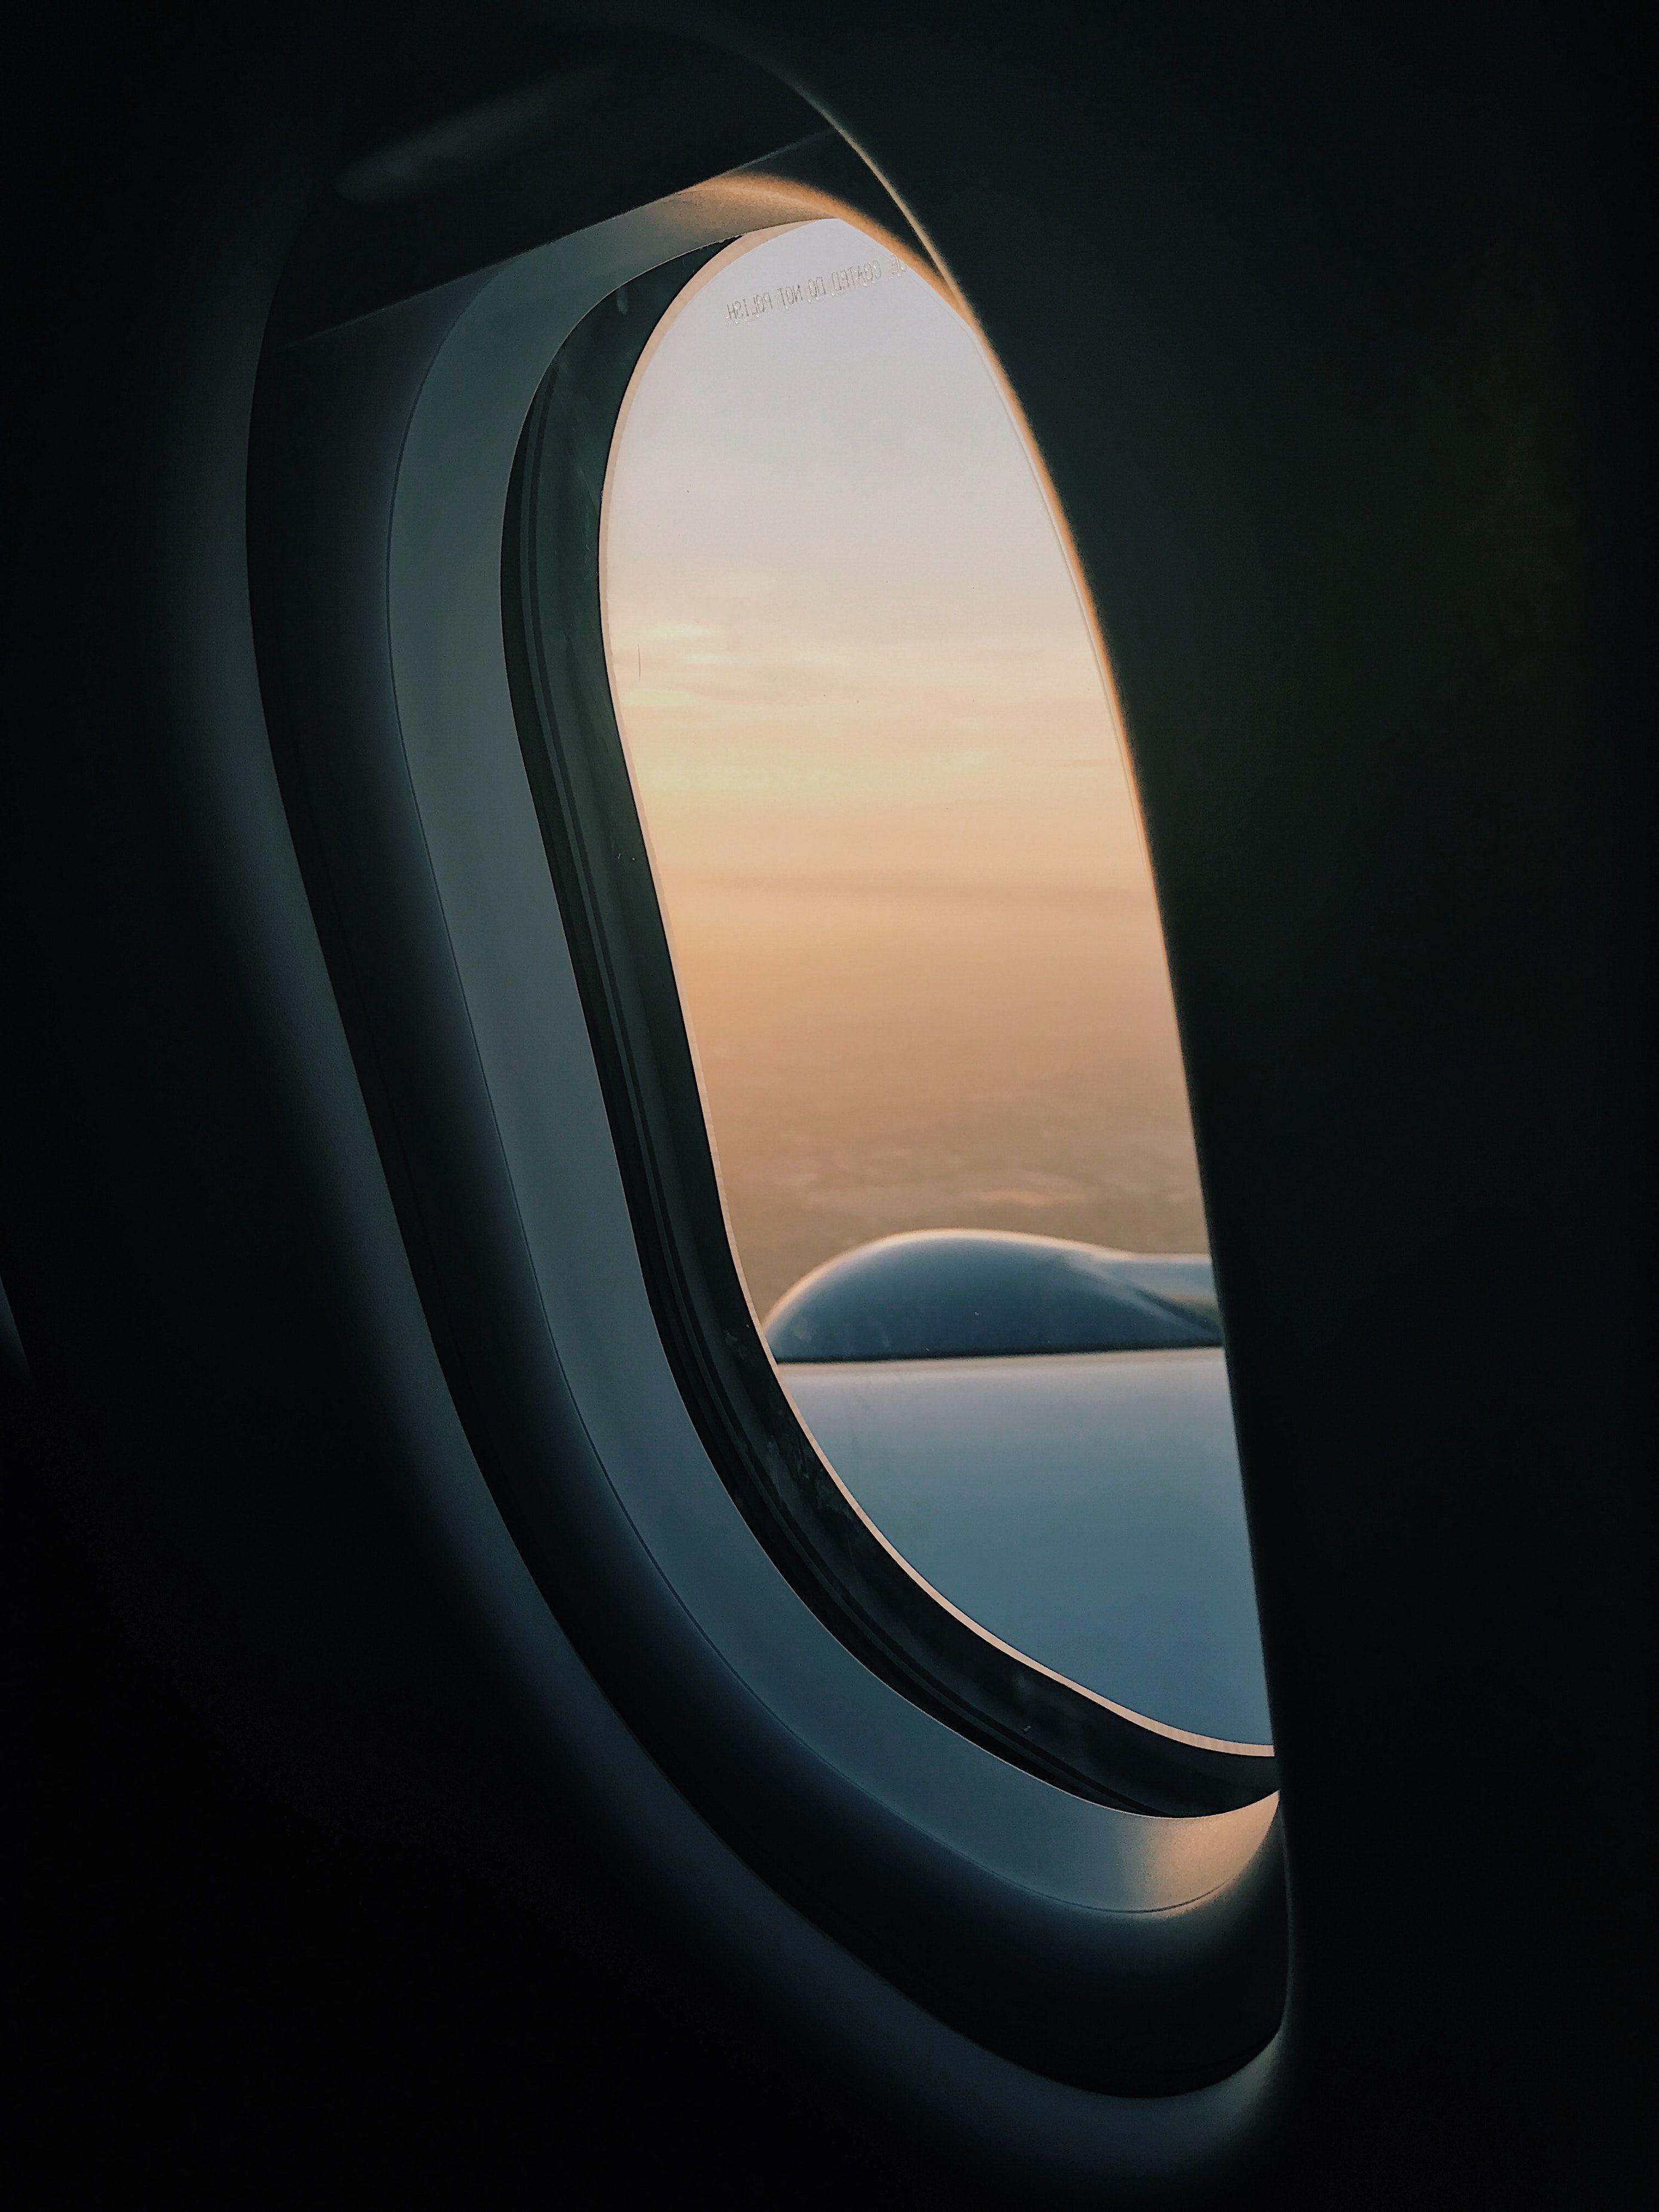 Airplane Window Plane Window Wallpaper Iphone Wallpapers Iphone Backgrounds Lock Screen Background Travel Airplane Window Plane Window Iphone Wallpaper